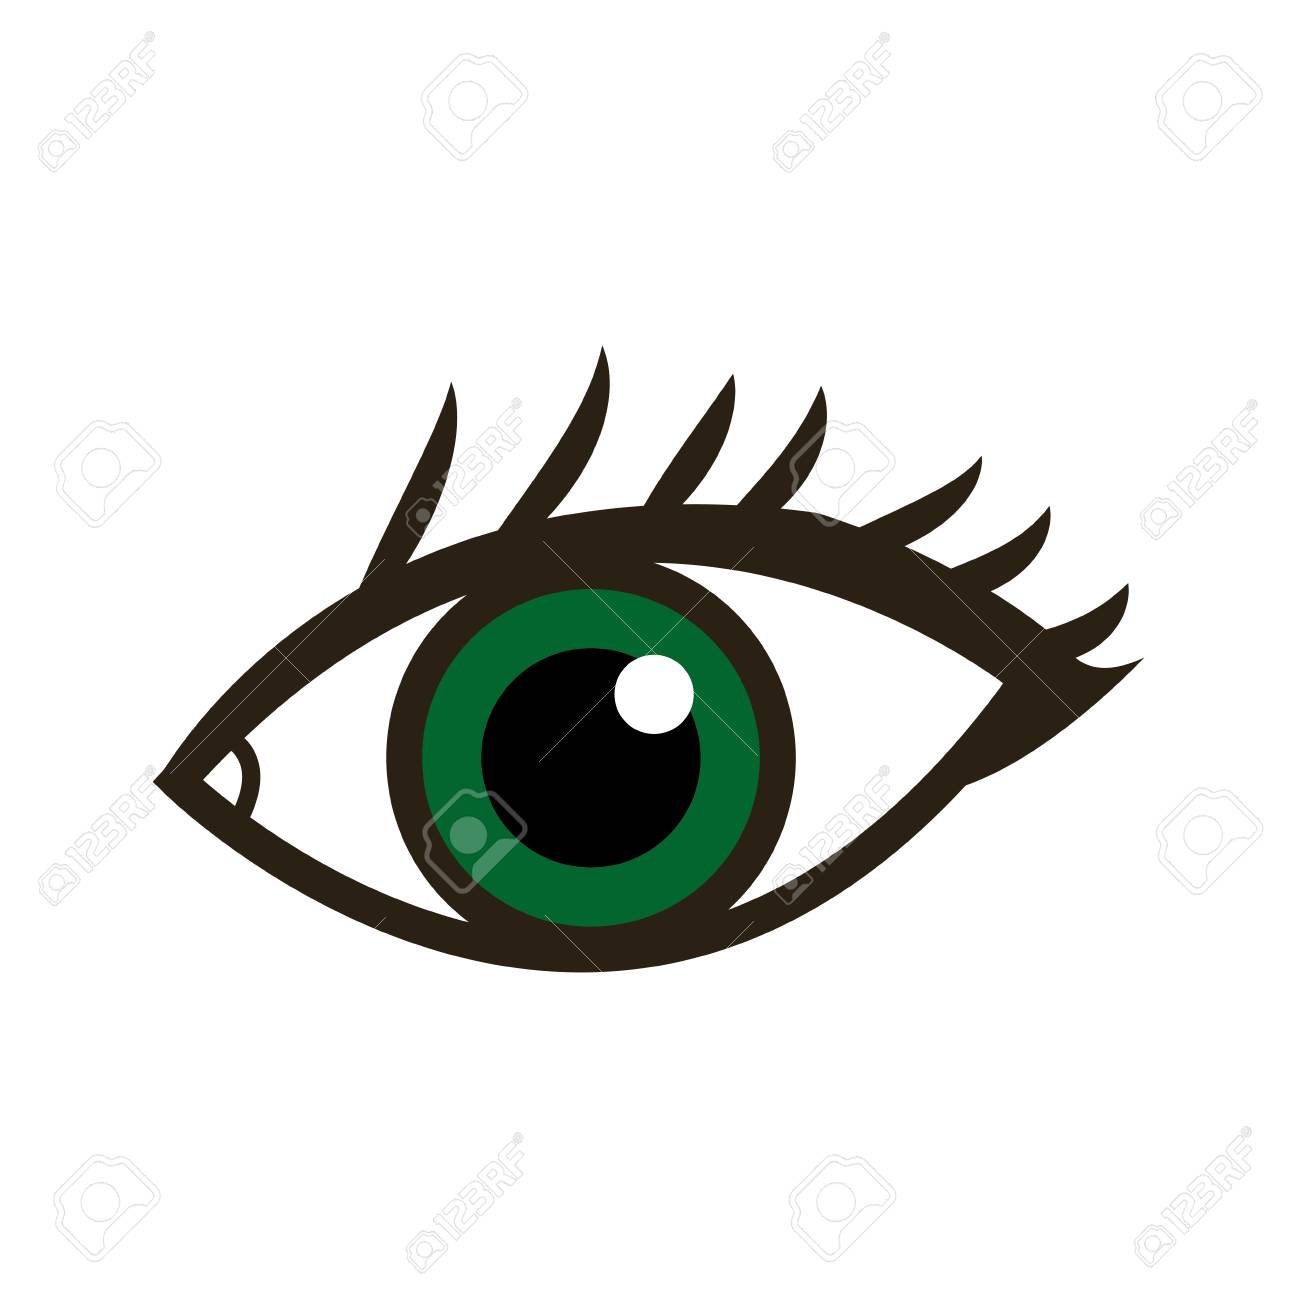 Cartoon Eye Human Vision Look Watch Icon Vector Illustration Royalty Free Cliparts Vectors And Stock Illustration Image 79059714